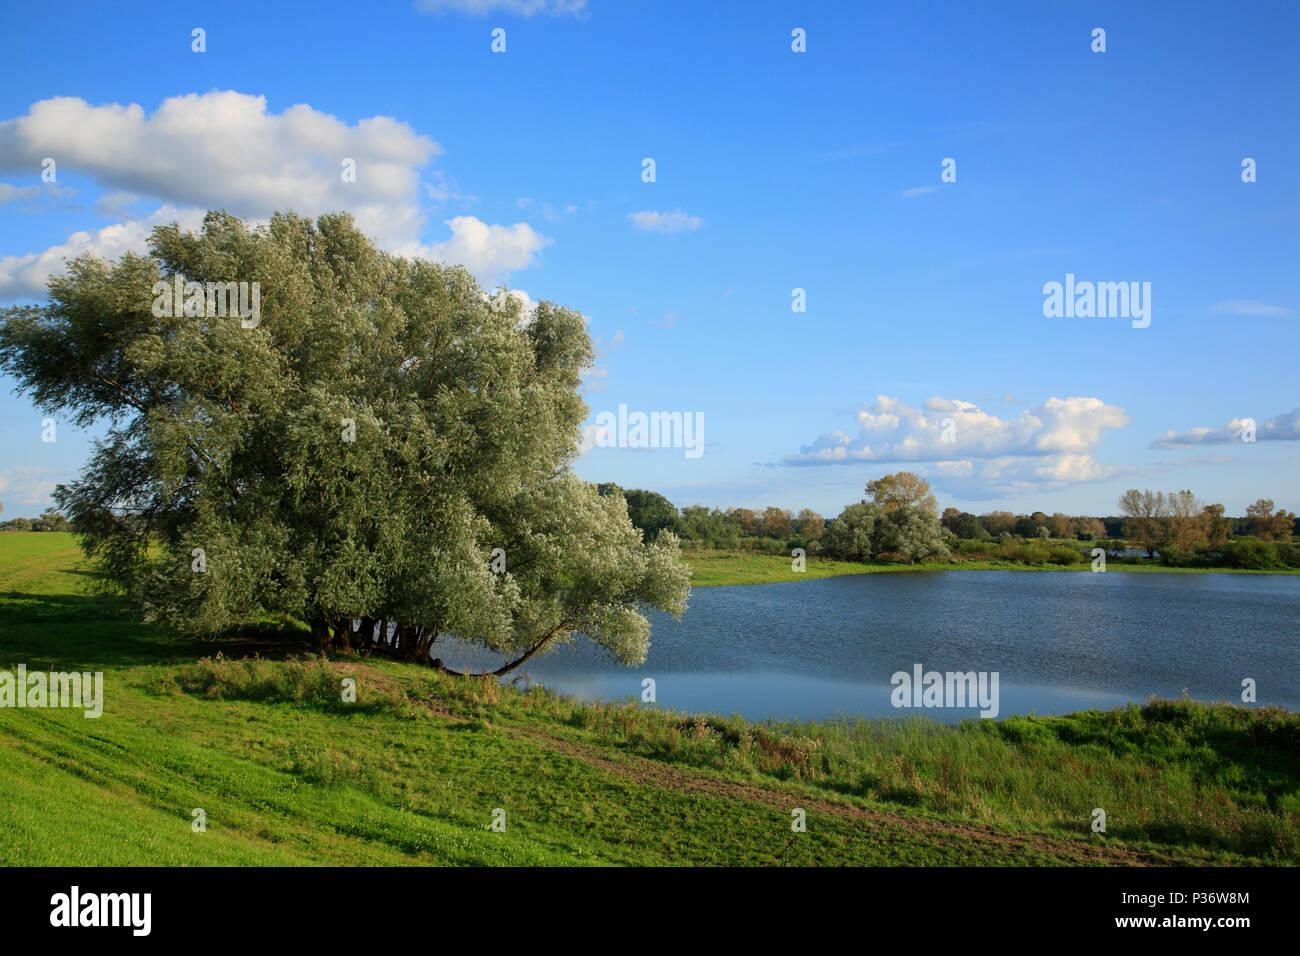 River Elbe, Stiepelsee, Amt Neuhaus, Lower Saxony, Germany - Stock Image